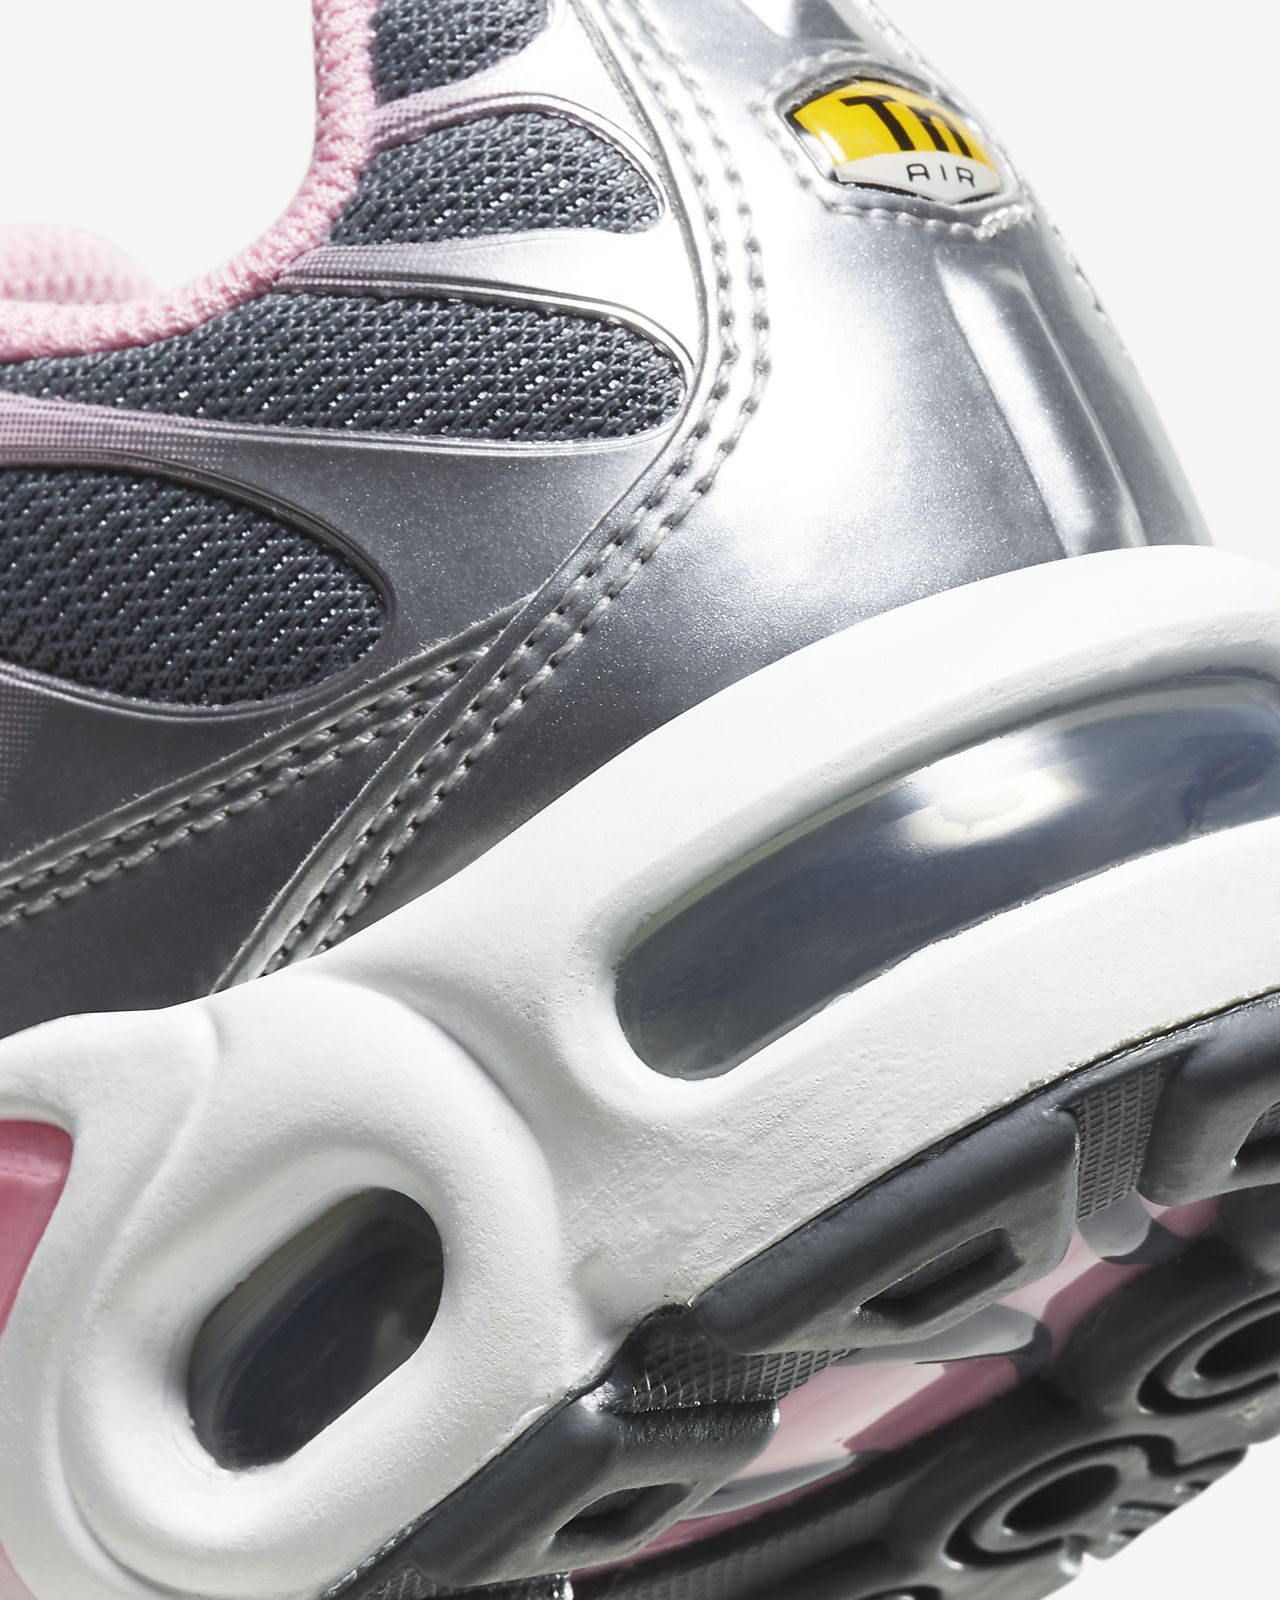 Nike Air Max Plus Schuh für ältere Kinder